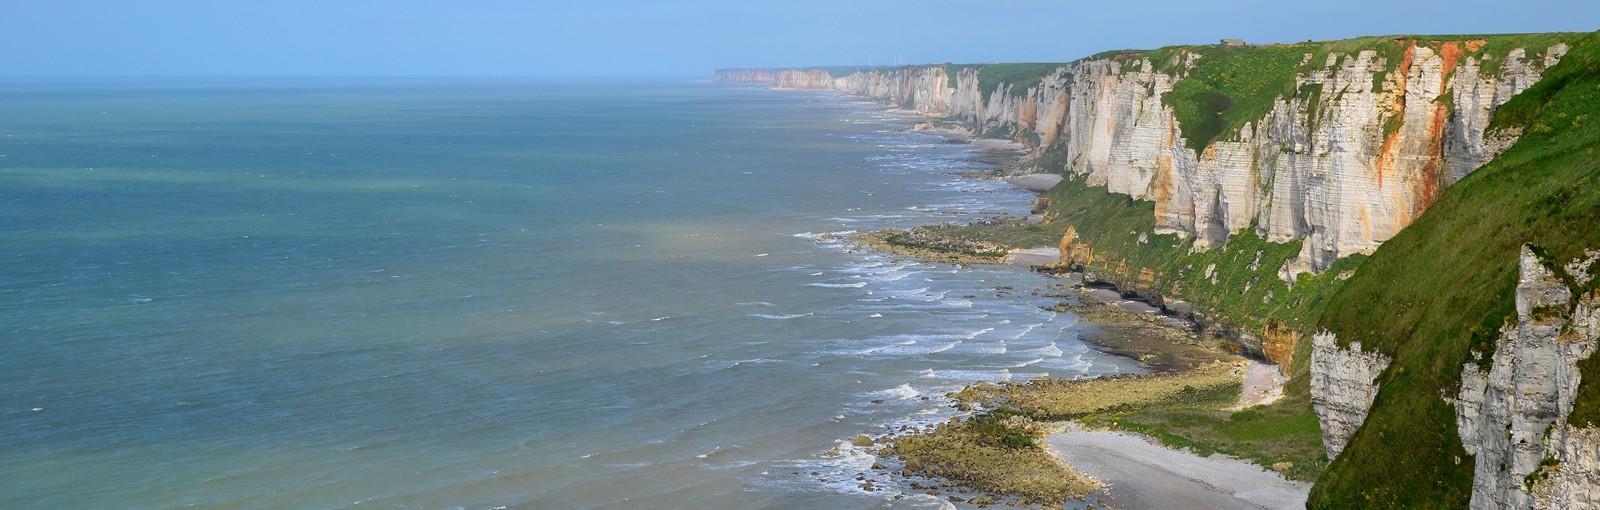 The Alabaster coast near Fecamp